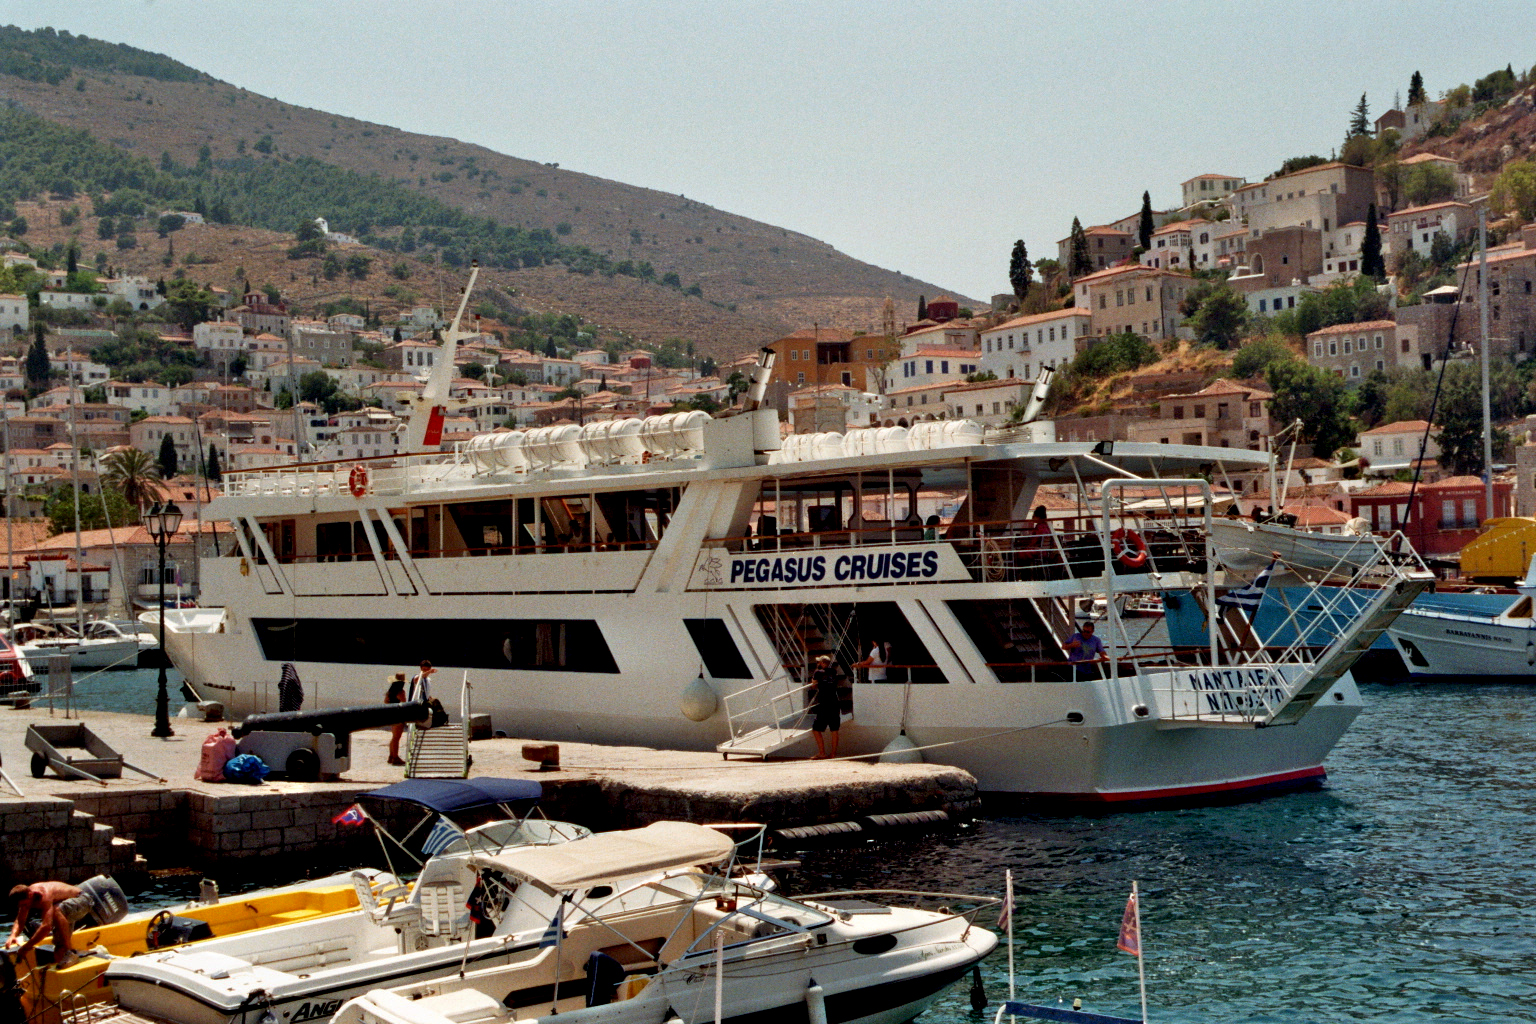 Pegasus Cruises Tagesfahrten nach Hydra und Spetses